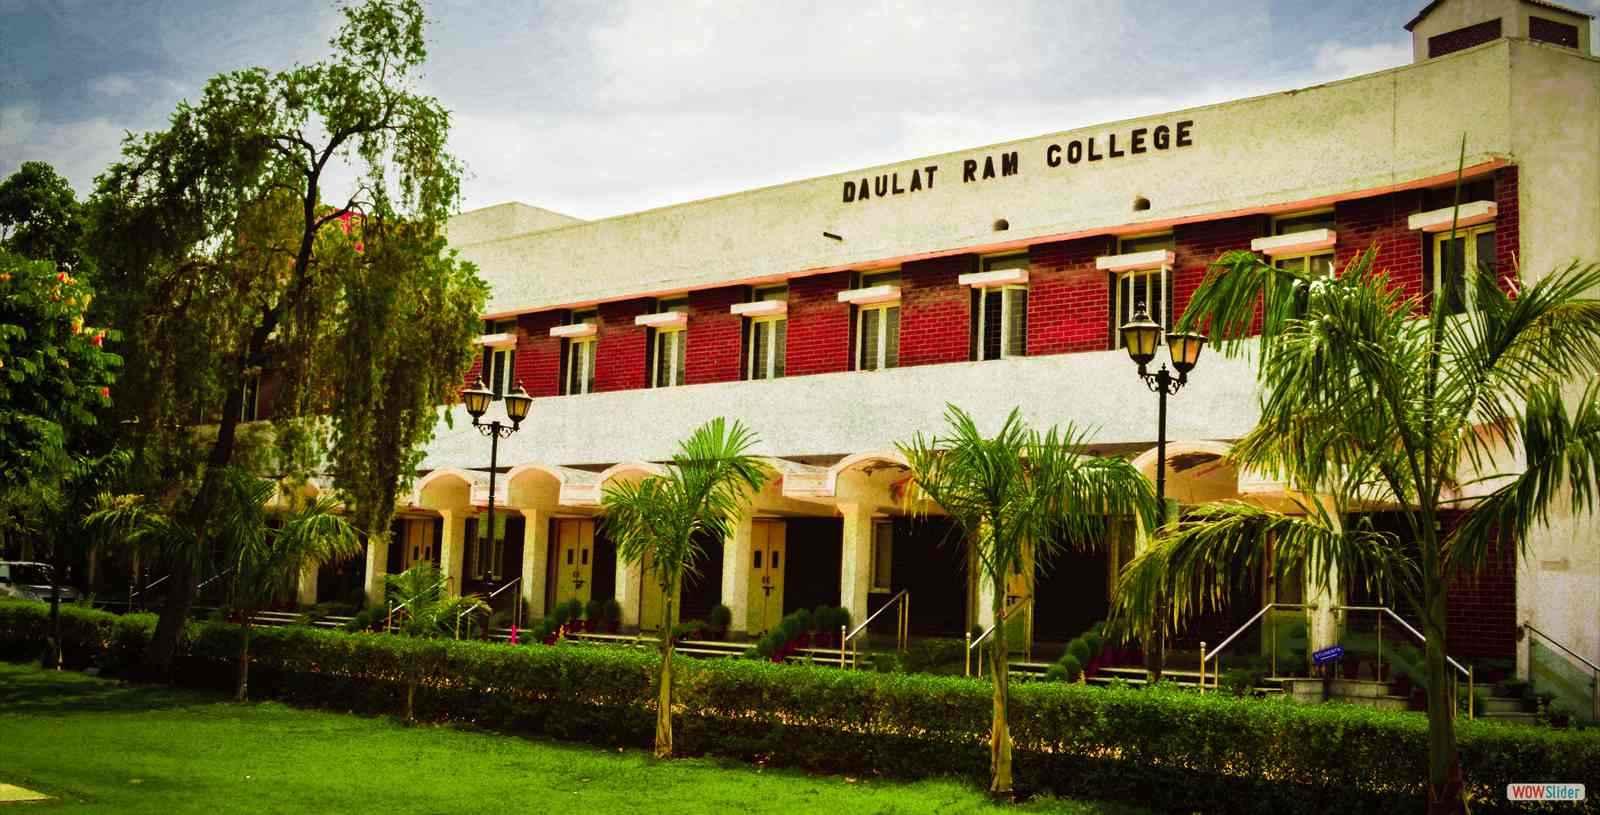 Daulat Ram College, Delhi